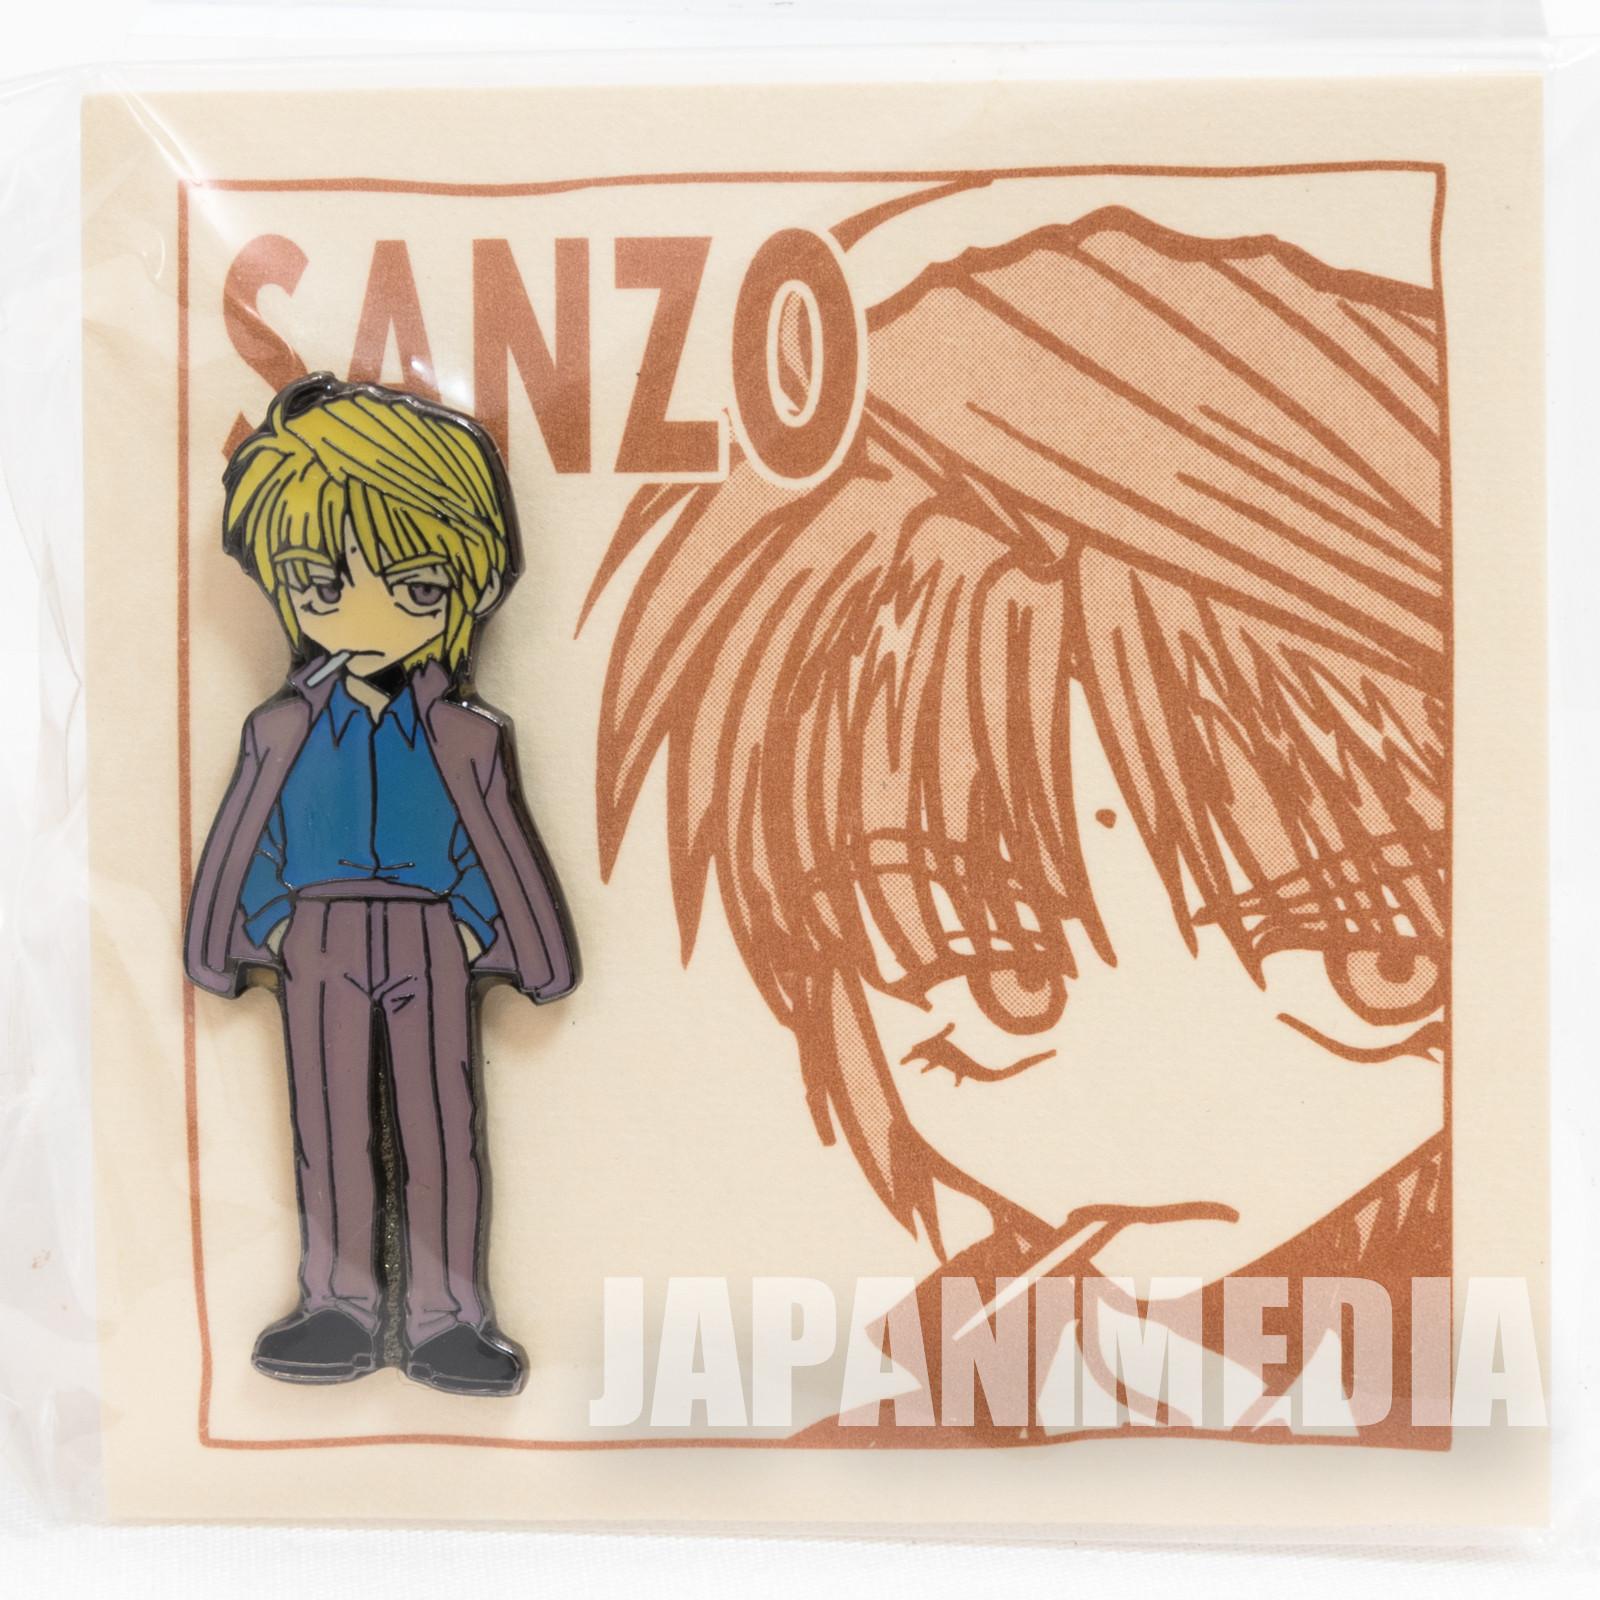 Gensomaden SAIYUKI Genjyo Sanzo Metal Pins JAPAN ANIME MANGA 2